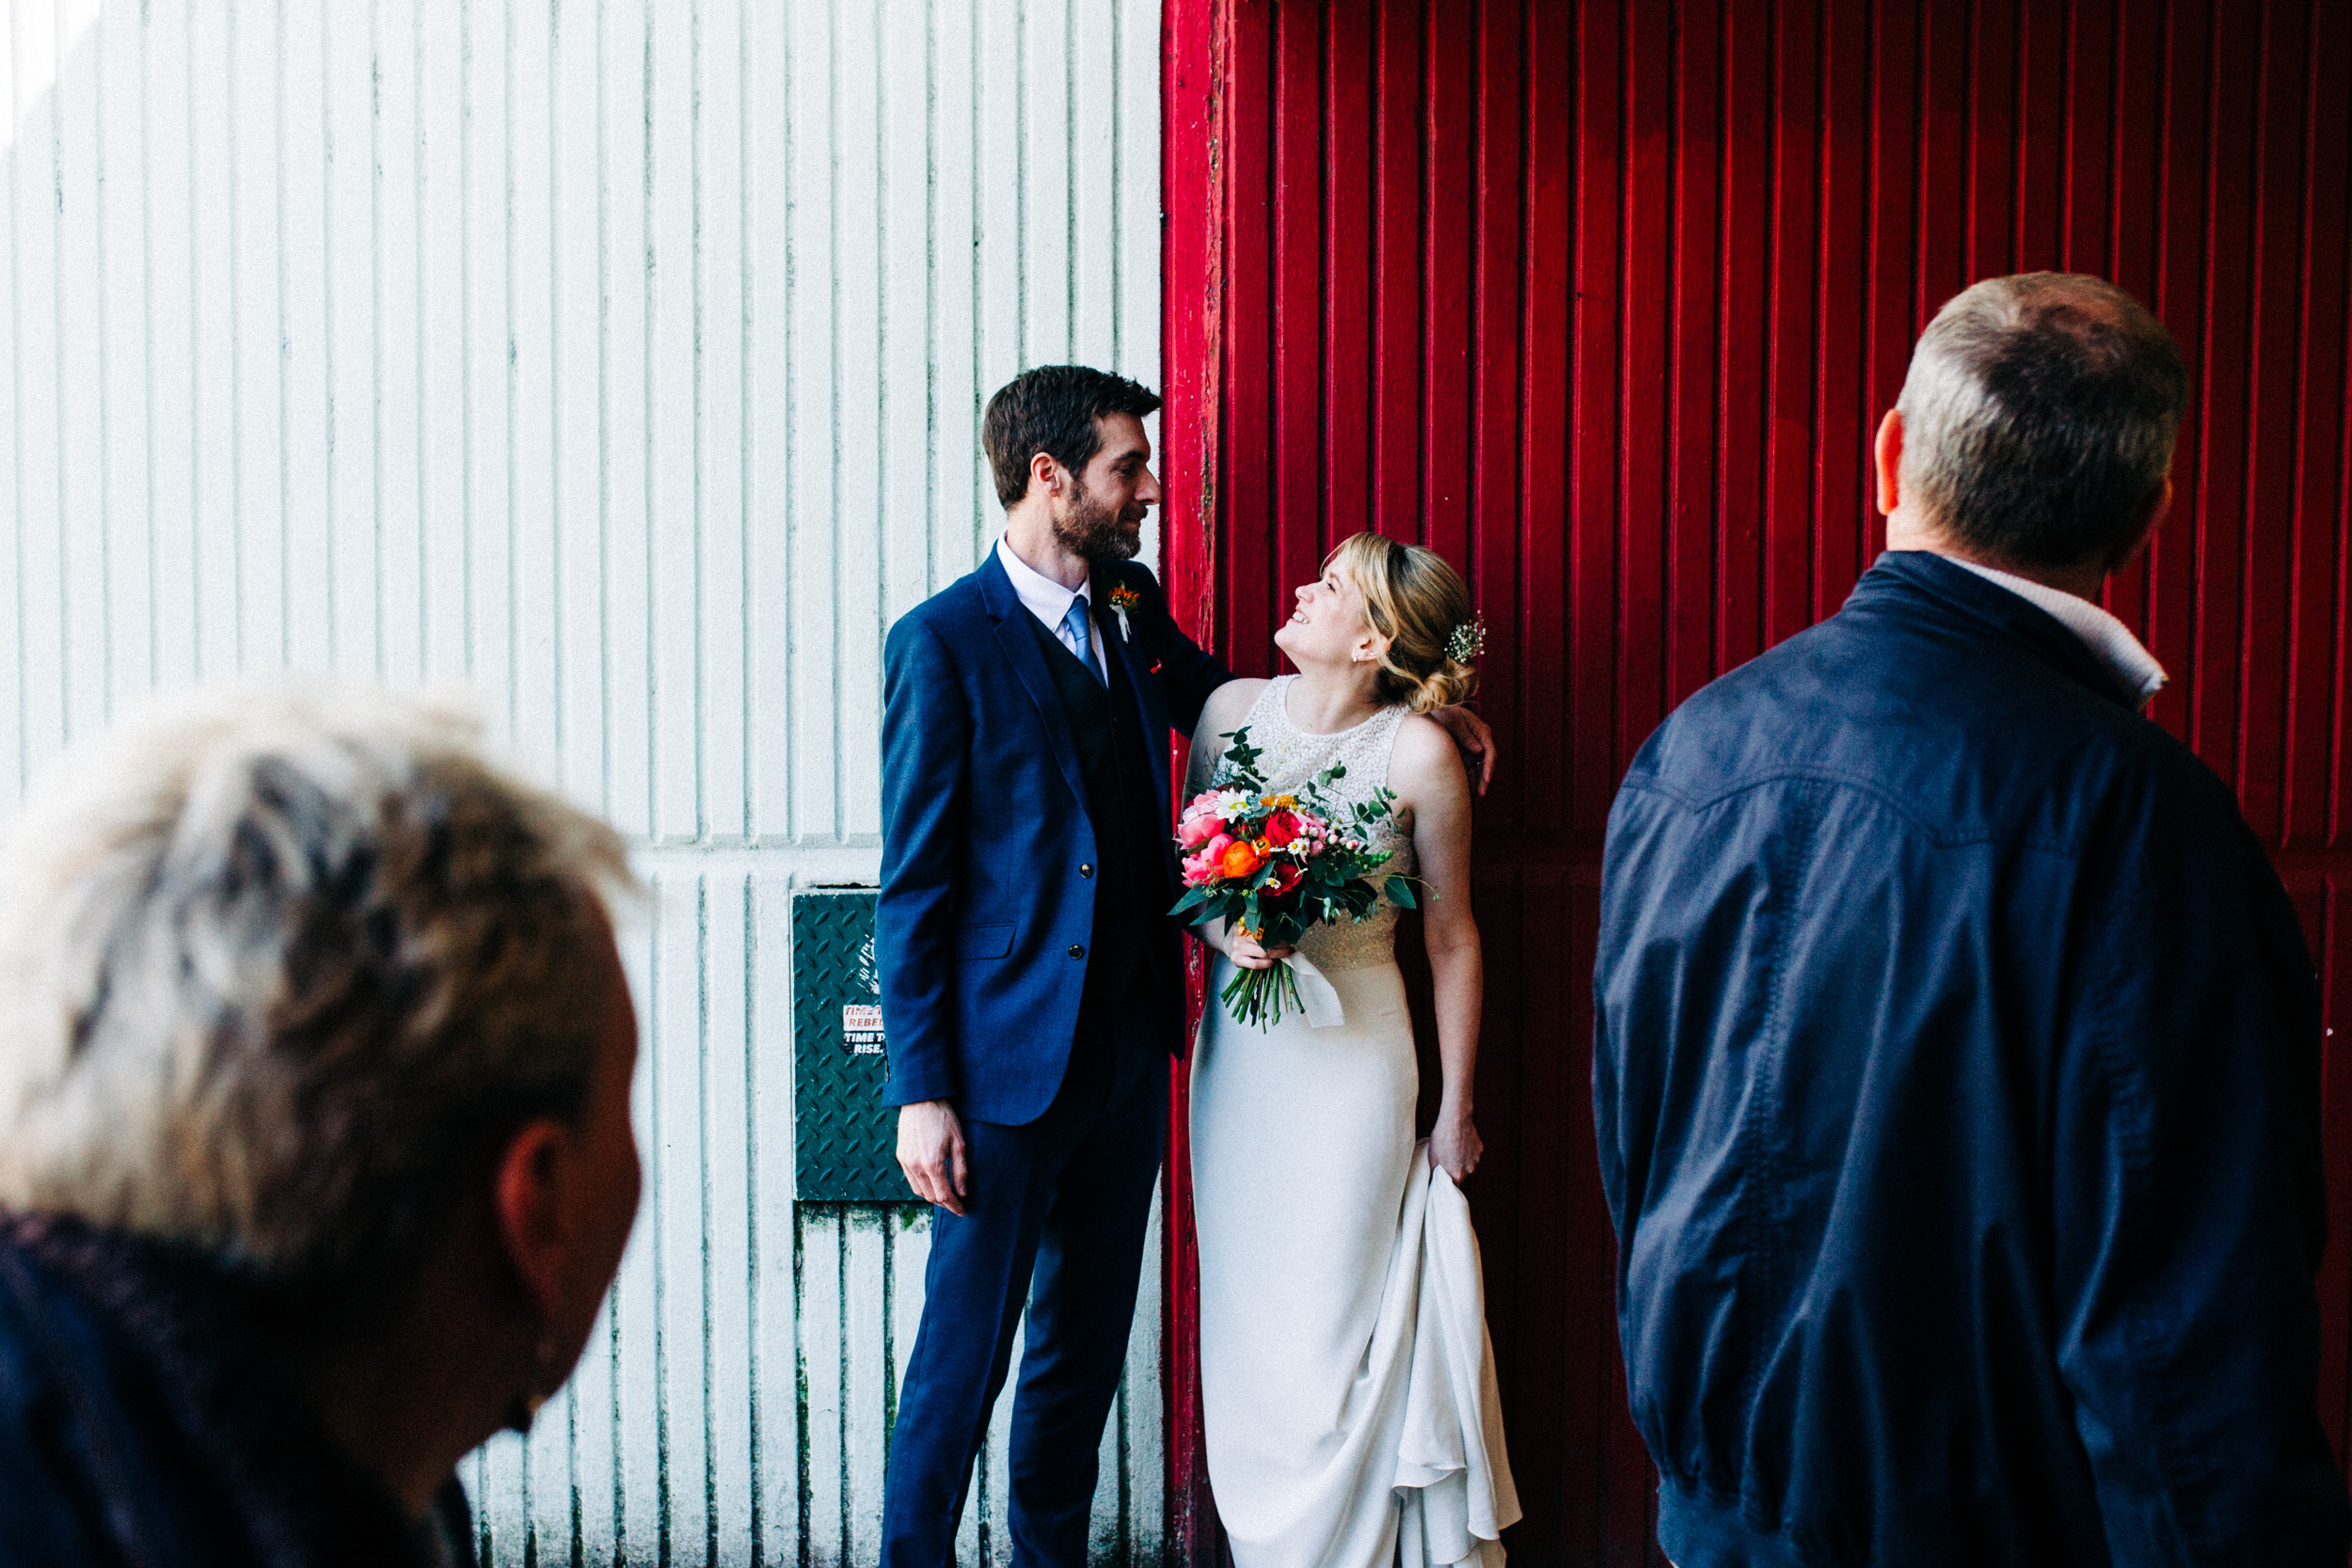 Cardiff Photographer Alex Sedgmond - Photography South Wales - The Printhaus, Cardiff Wedding Photography-5.jpg